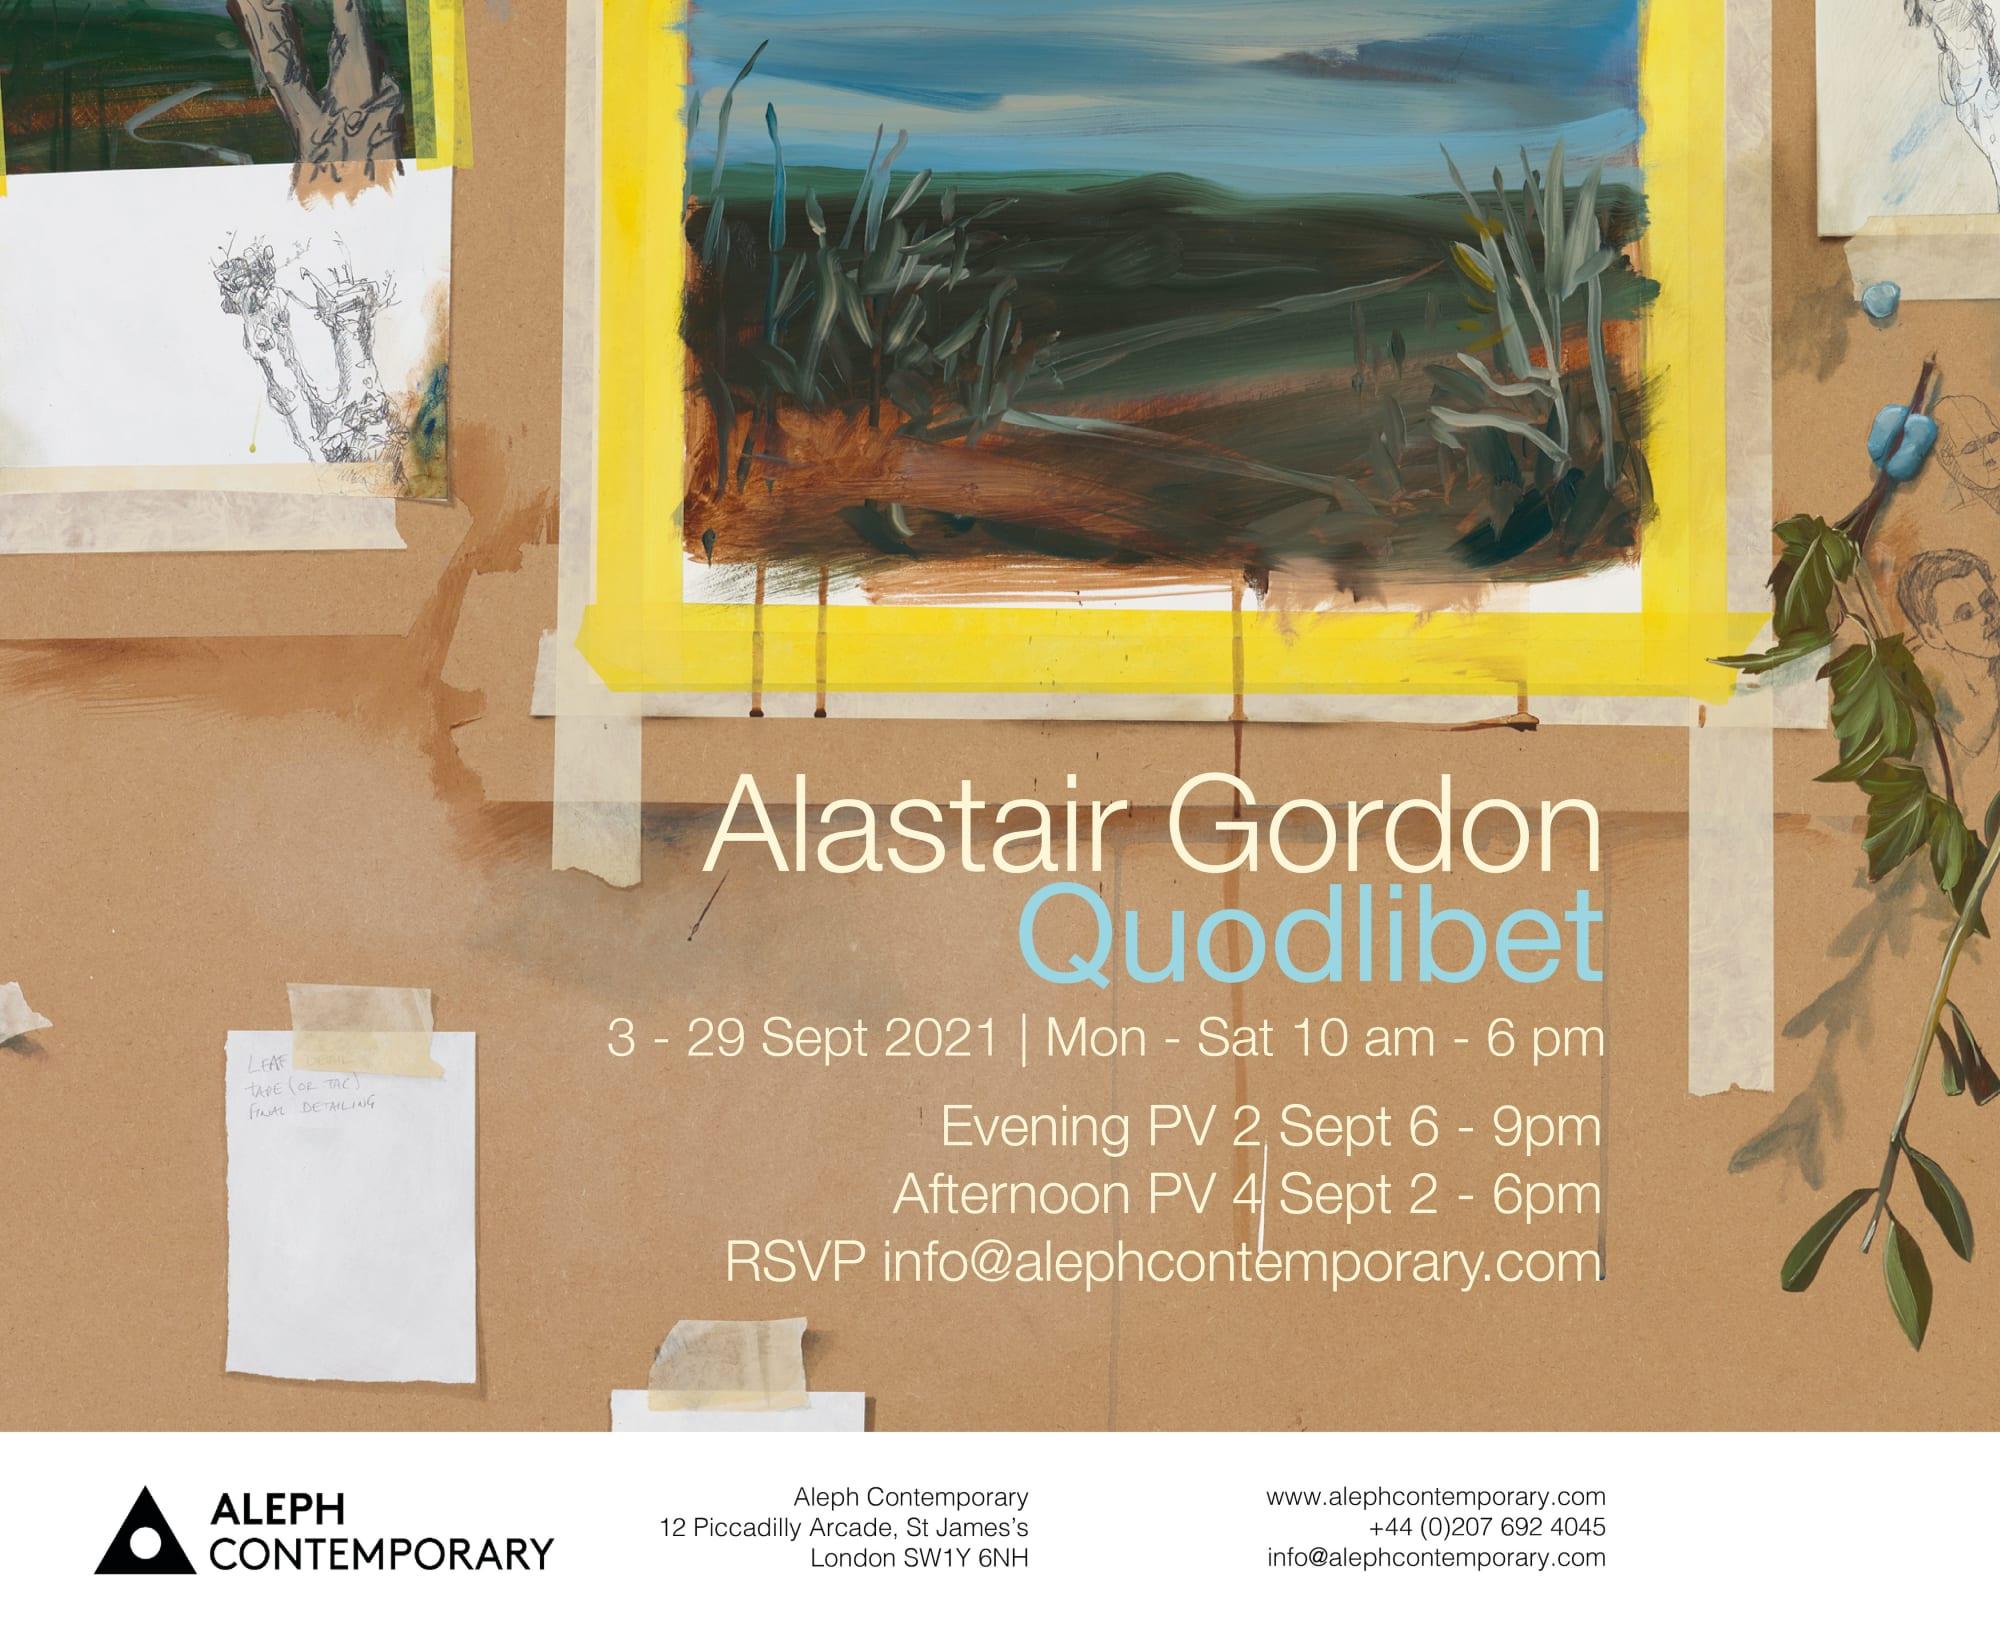 'Quodlibet' : Alastair Gordon